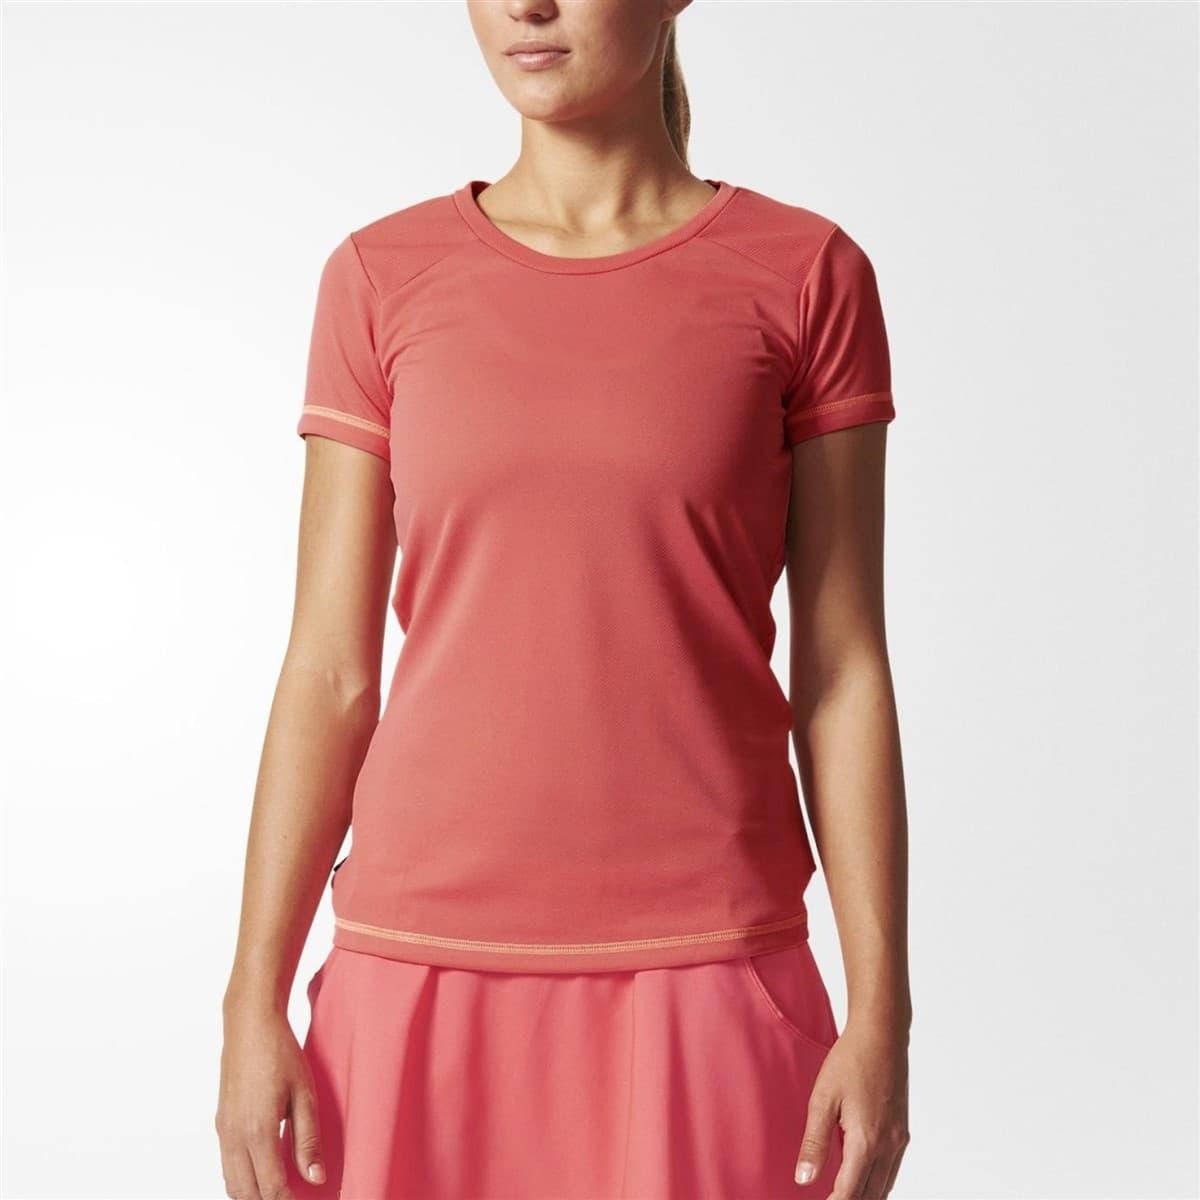 adidas Fleur Kadın Pembe Spor Tişört (AJ3921)